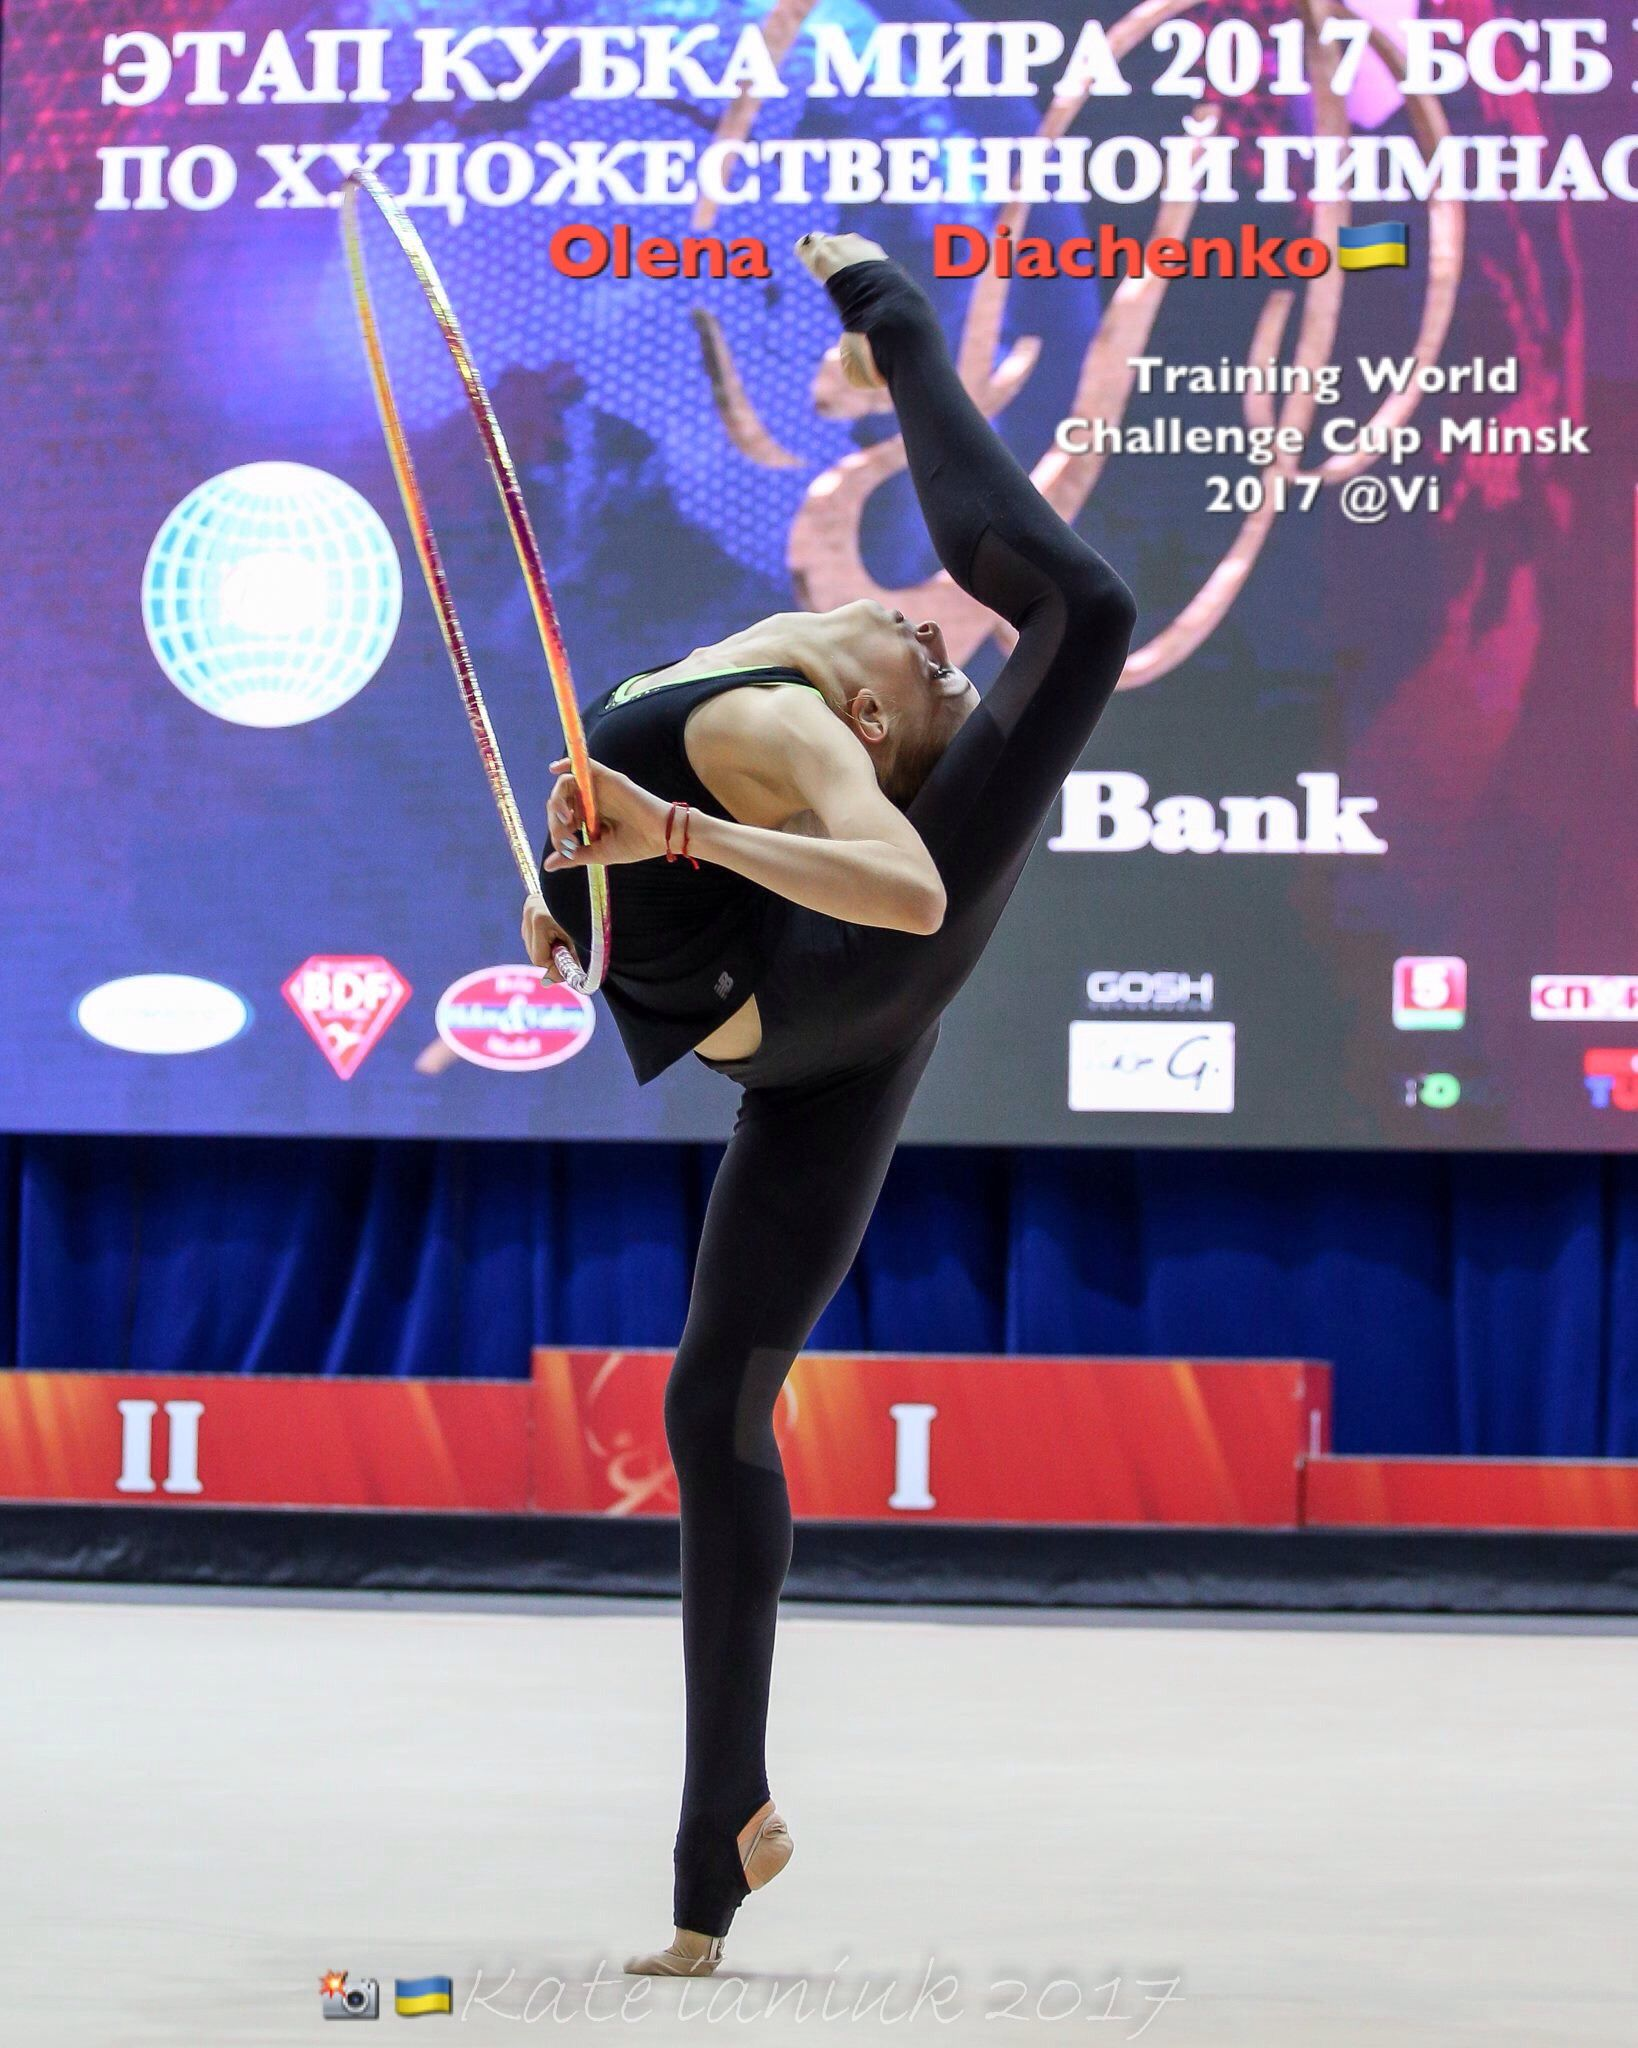 Olena DIACHENKO (Ukraine)🇺🇦 ~ Hoop training @ World Challenge Cup Minsk 04/08/'17🇺🇦 ☘☘  Photo by 🇺🇦Kate Ianiuk.